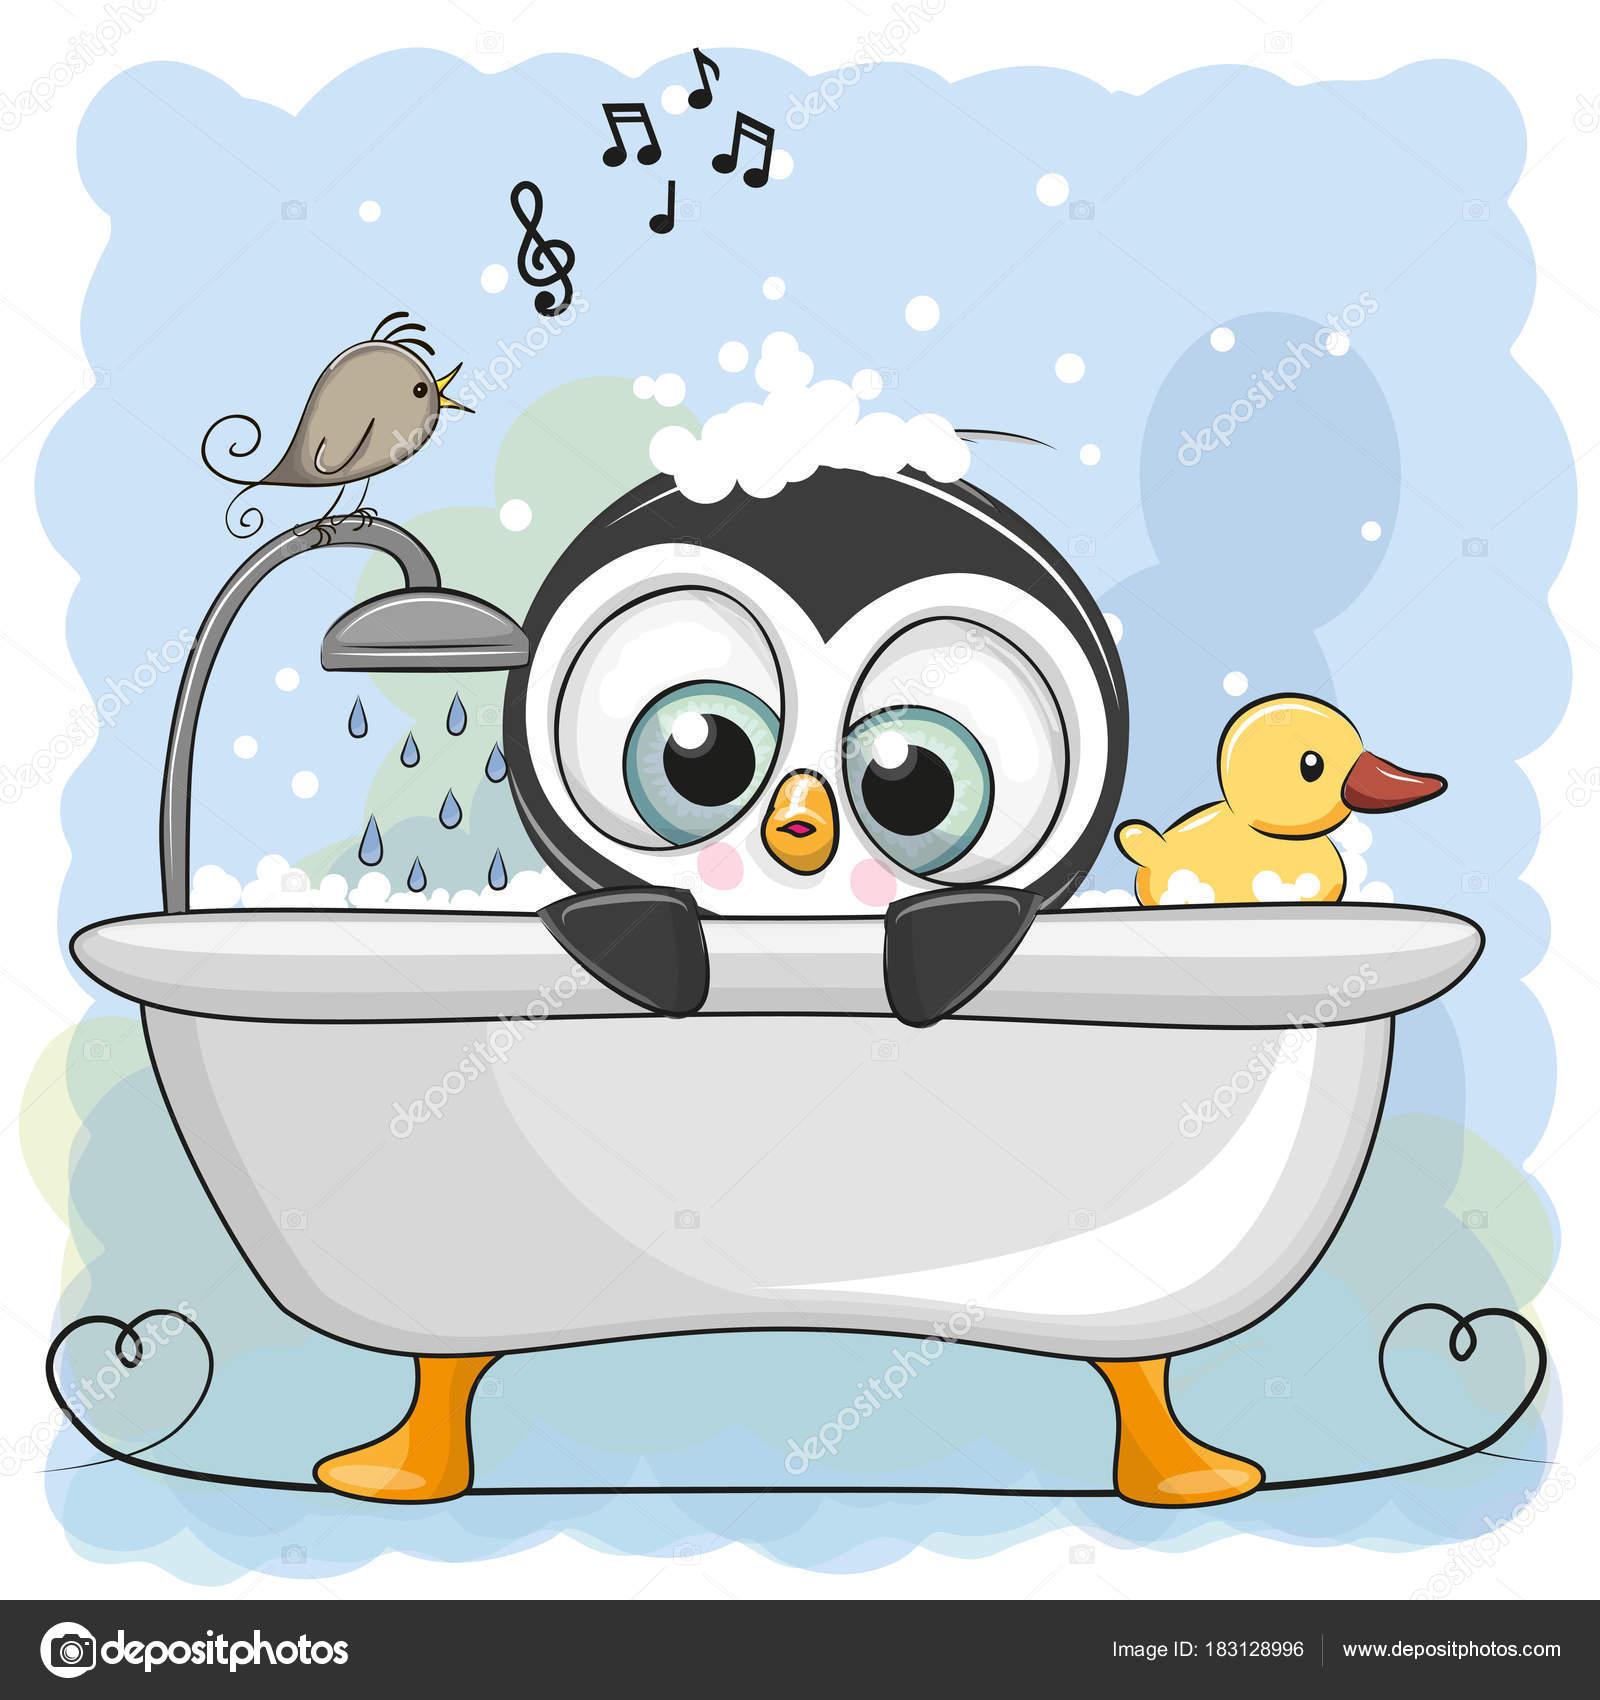 Niedliche cartoon pinguin im badezimmer stockvektor reginast777 183128996 - Badezimmer comic ...